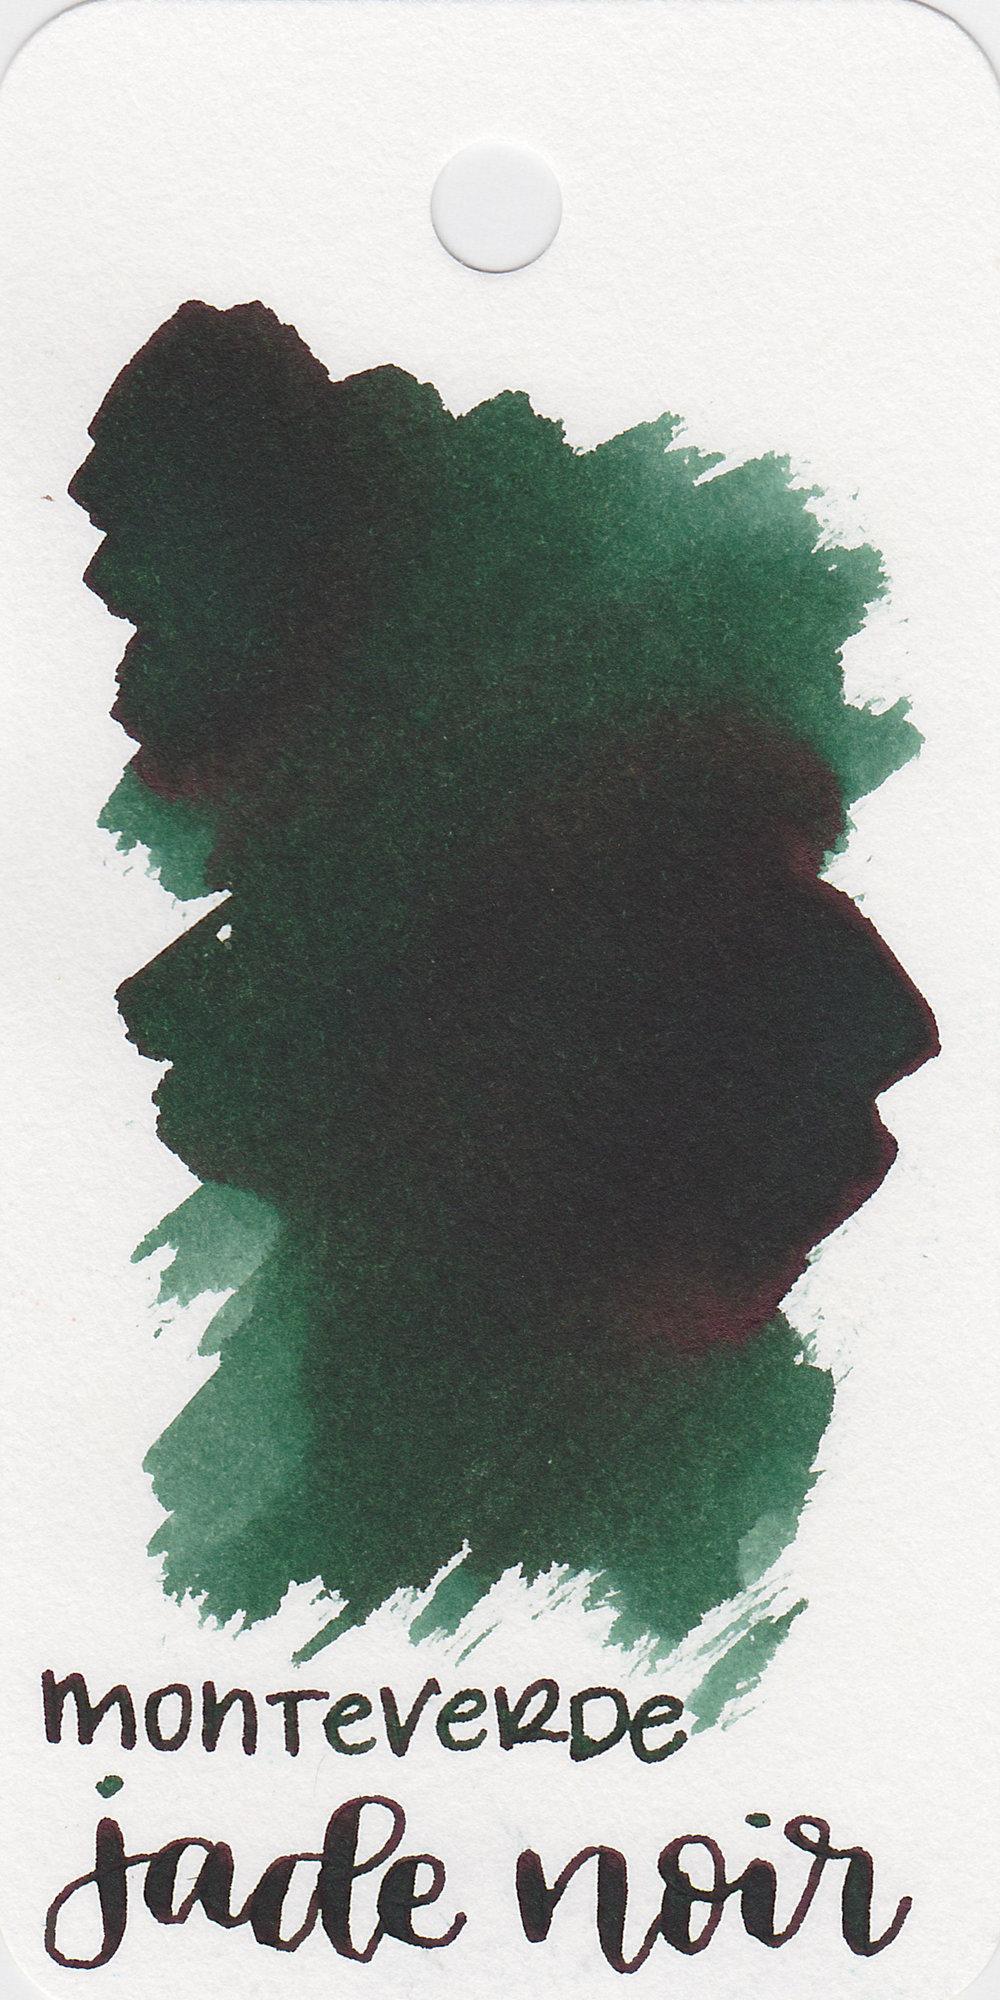 The color: - Jade Noir is a dark green.